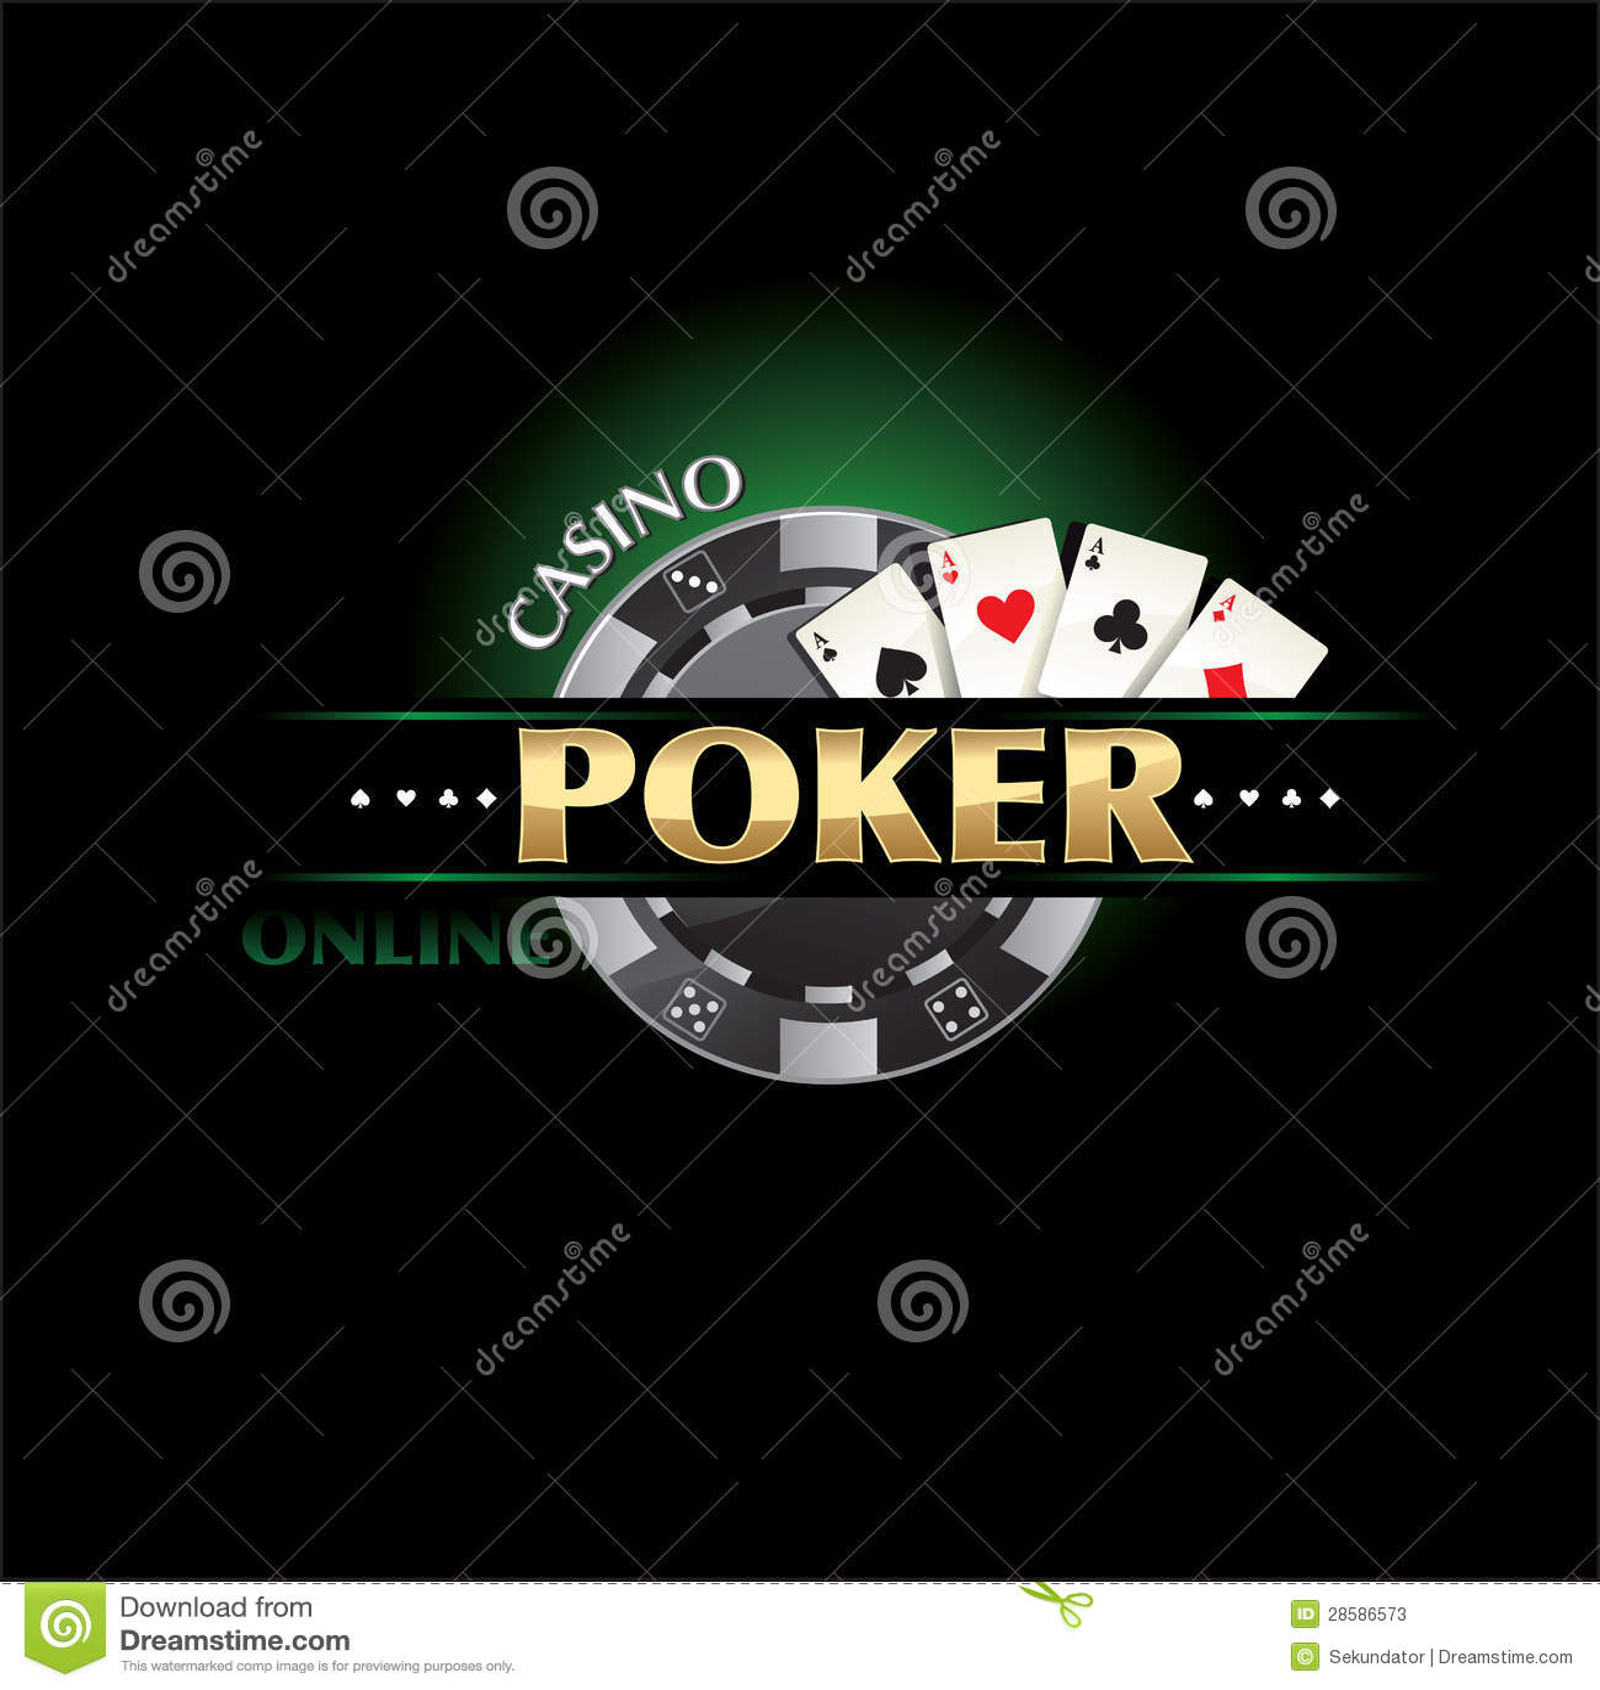 Jpg casino online